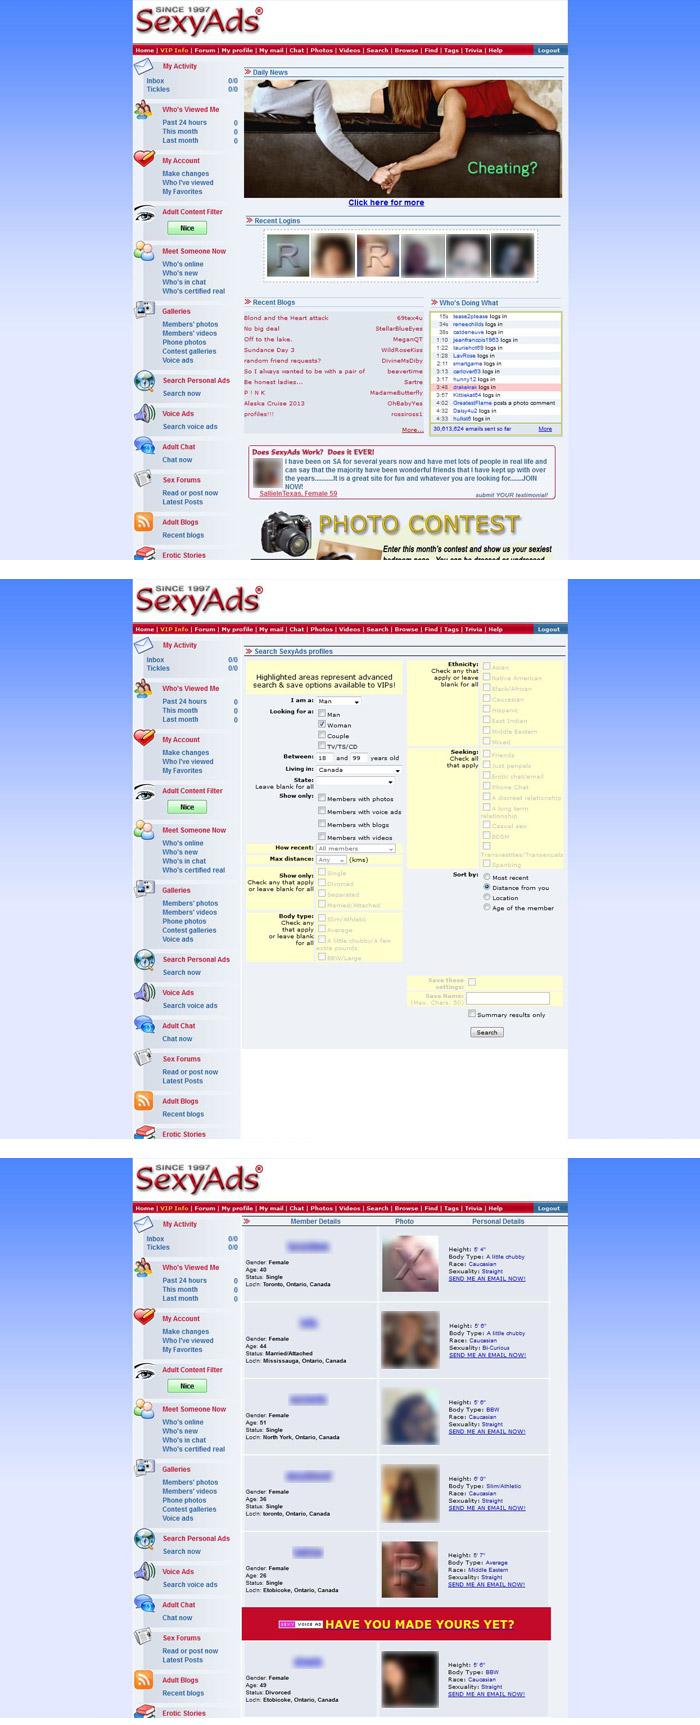 Visit Sexy Ads